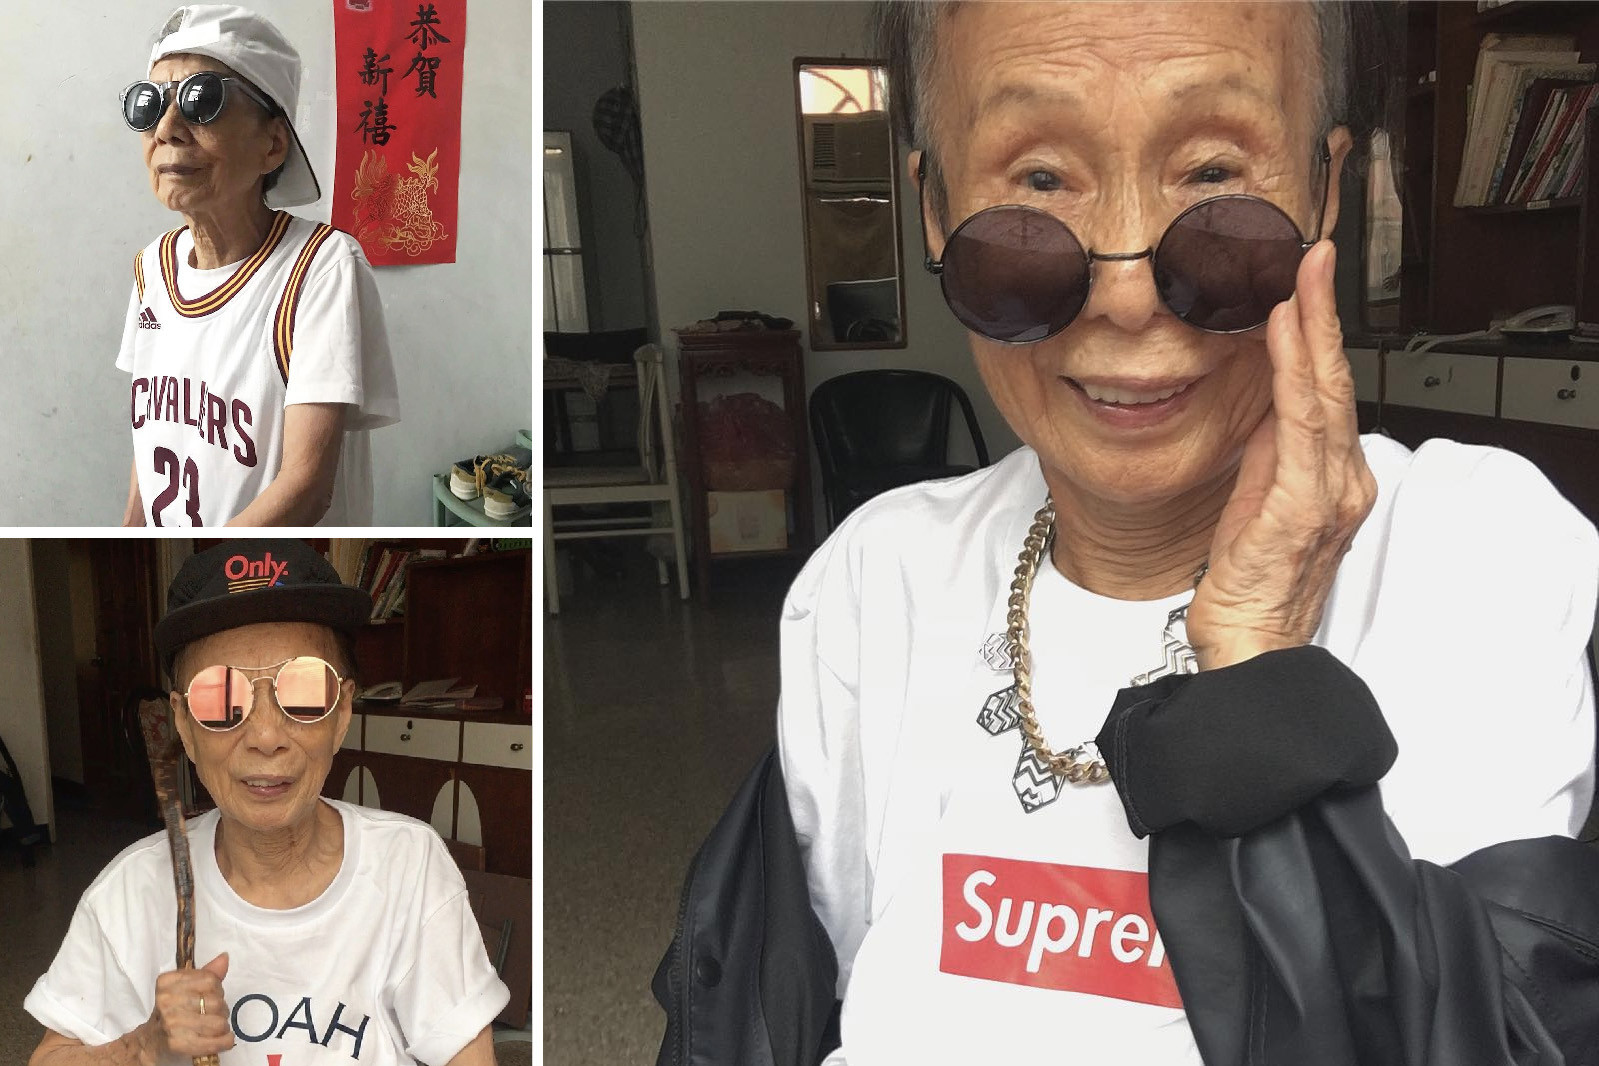 Instagram coolest senior citizens style old elderly people fashion icons baddie winkle moon lin lance dinneranddance accidental icon lili hayes supreme thrasher streetwear